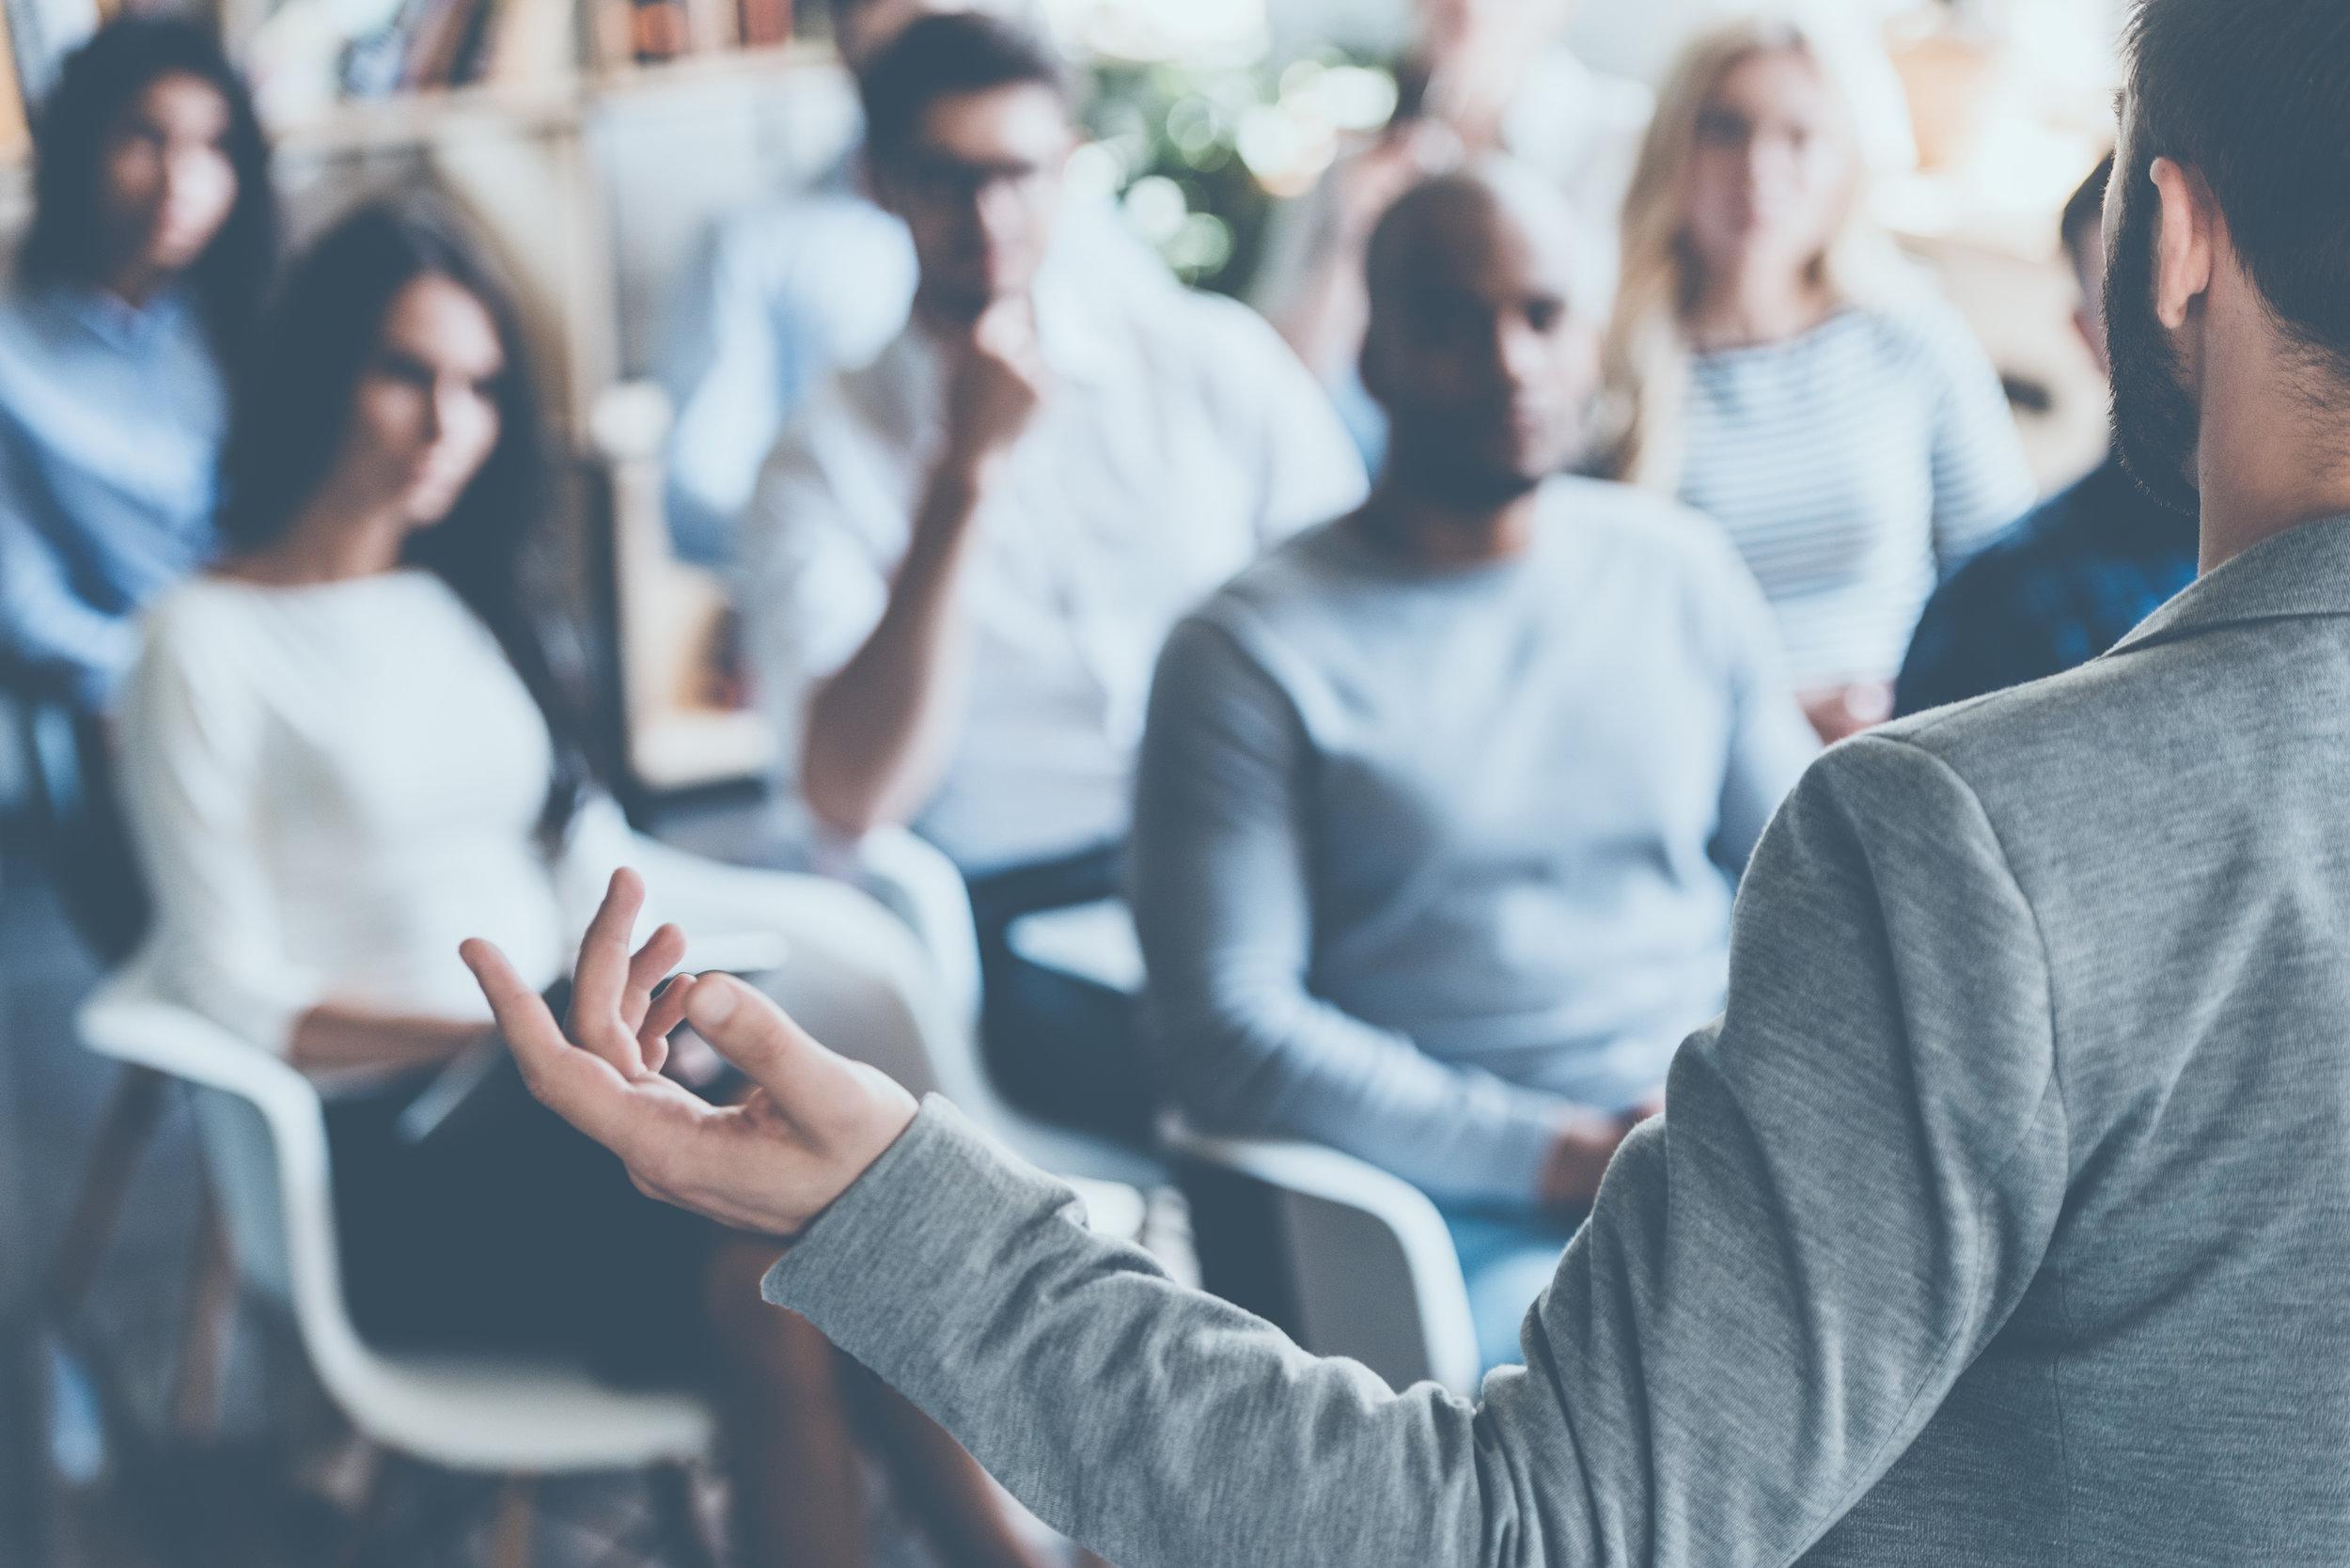 2019 Orlando Advanced Core Skills Training #5 - 20 & 21 Sep 2019 12:00 PM